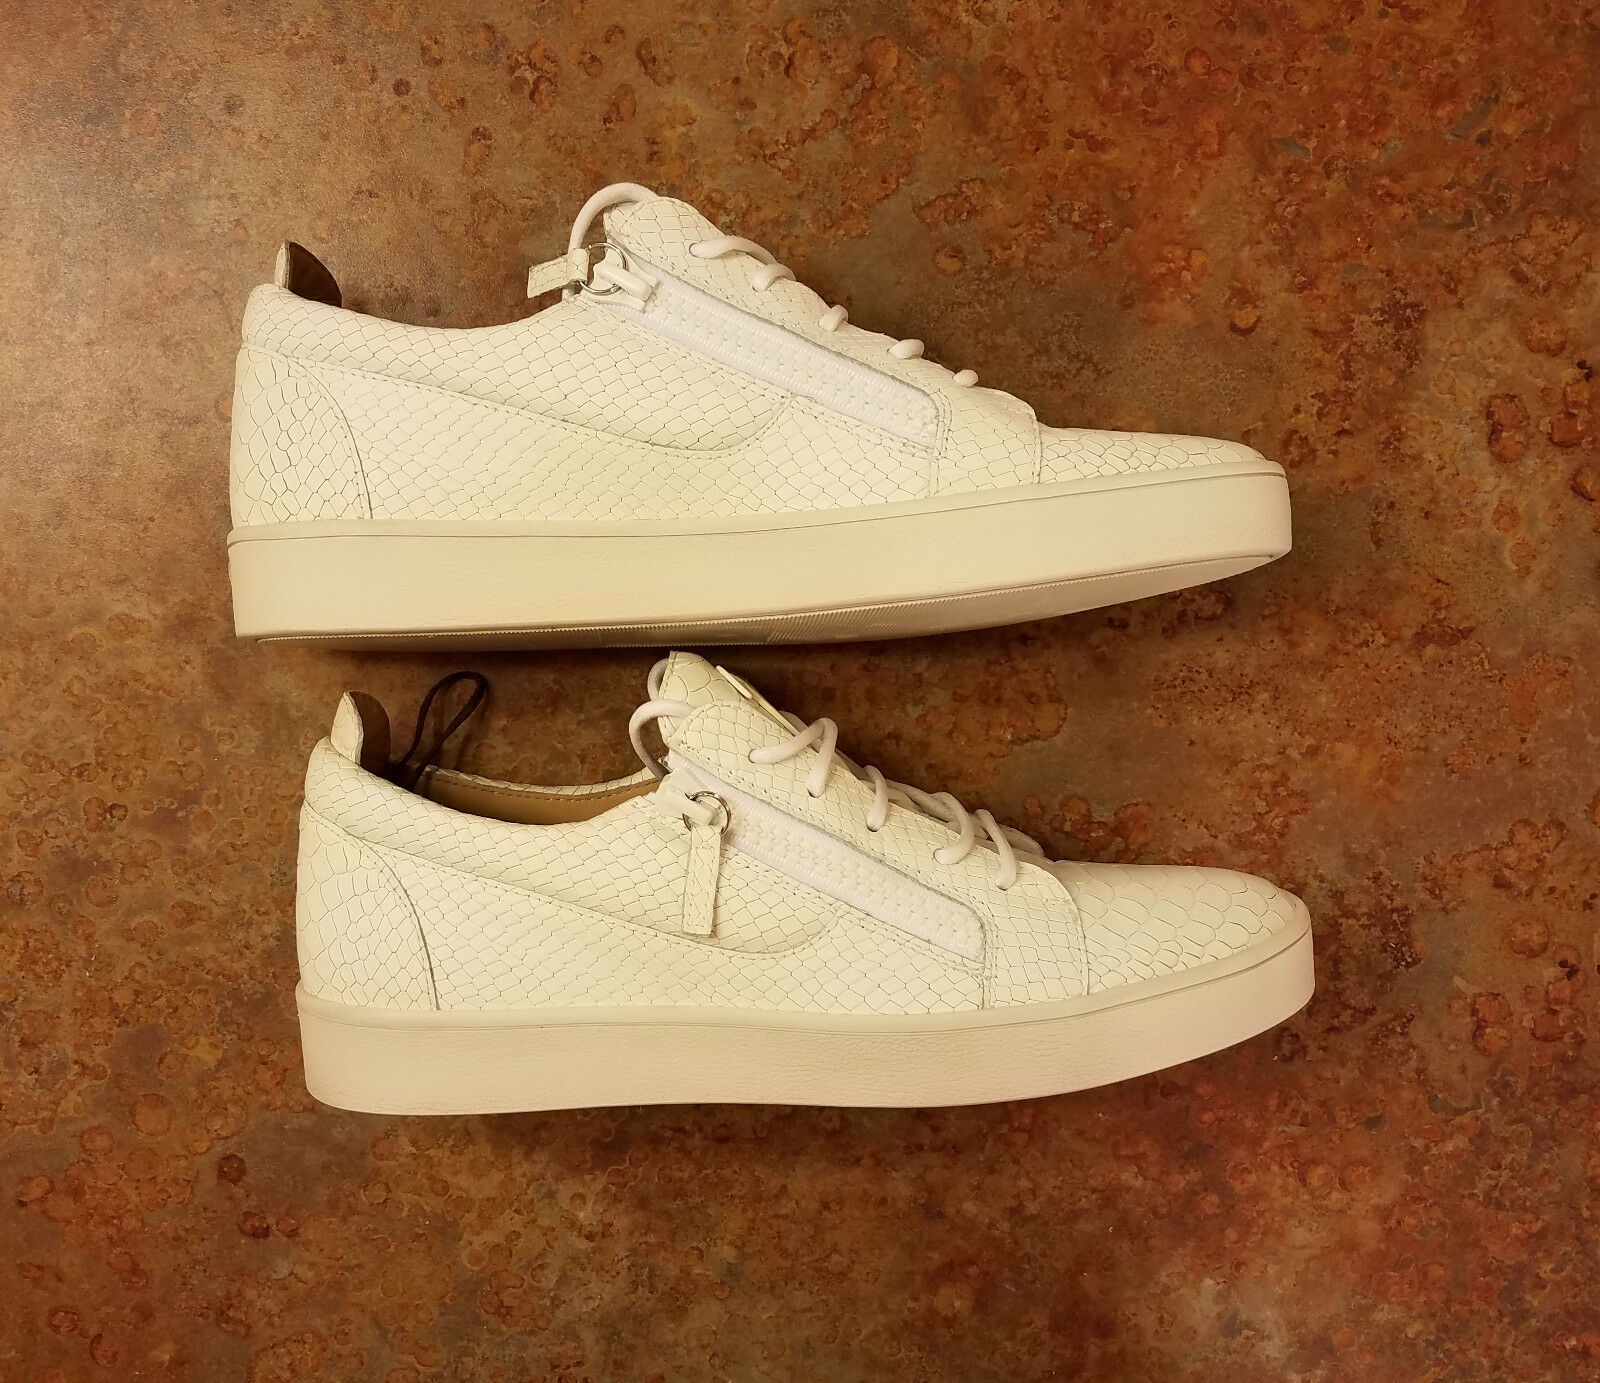 New  Giuseppe Zanotti Embossed Side Zip Zip Zip scarpe da ginnastica bianca Uomo 10 US 43 Eur MSRP  695 122233